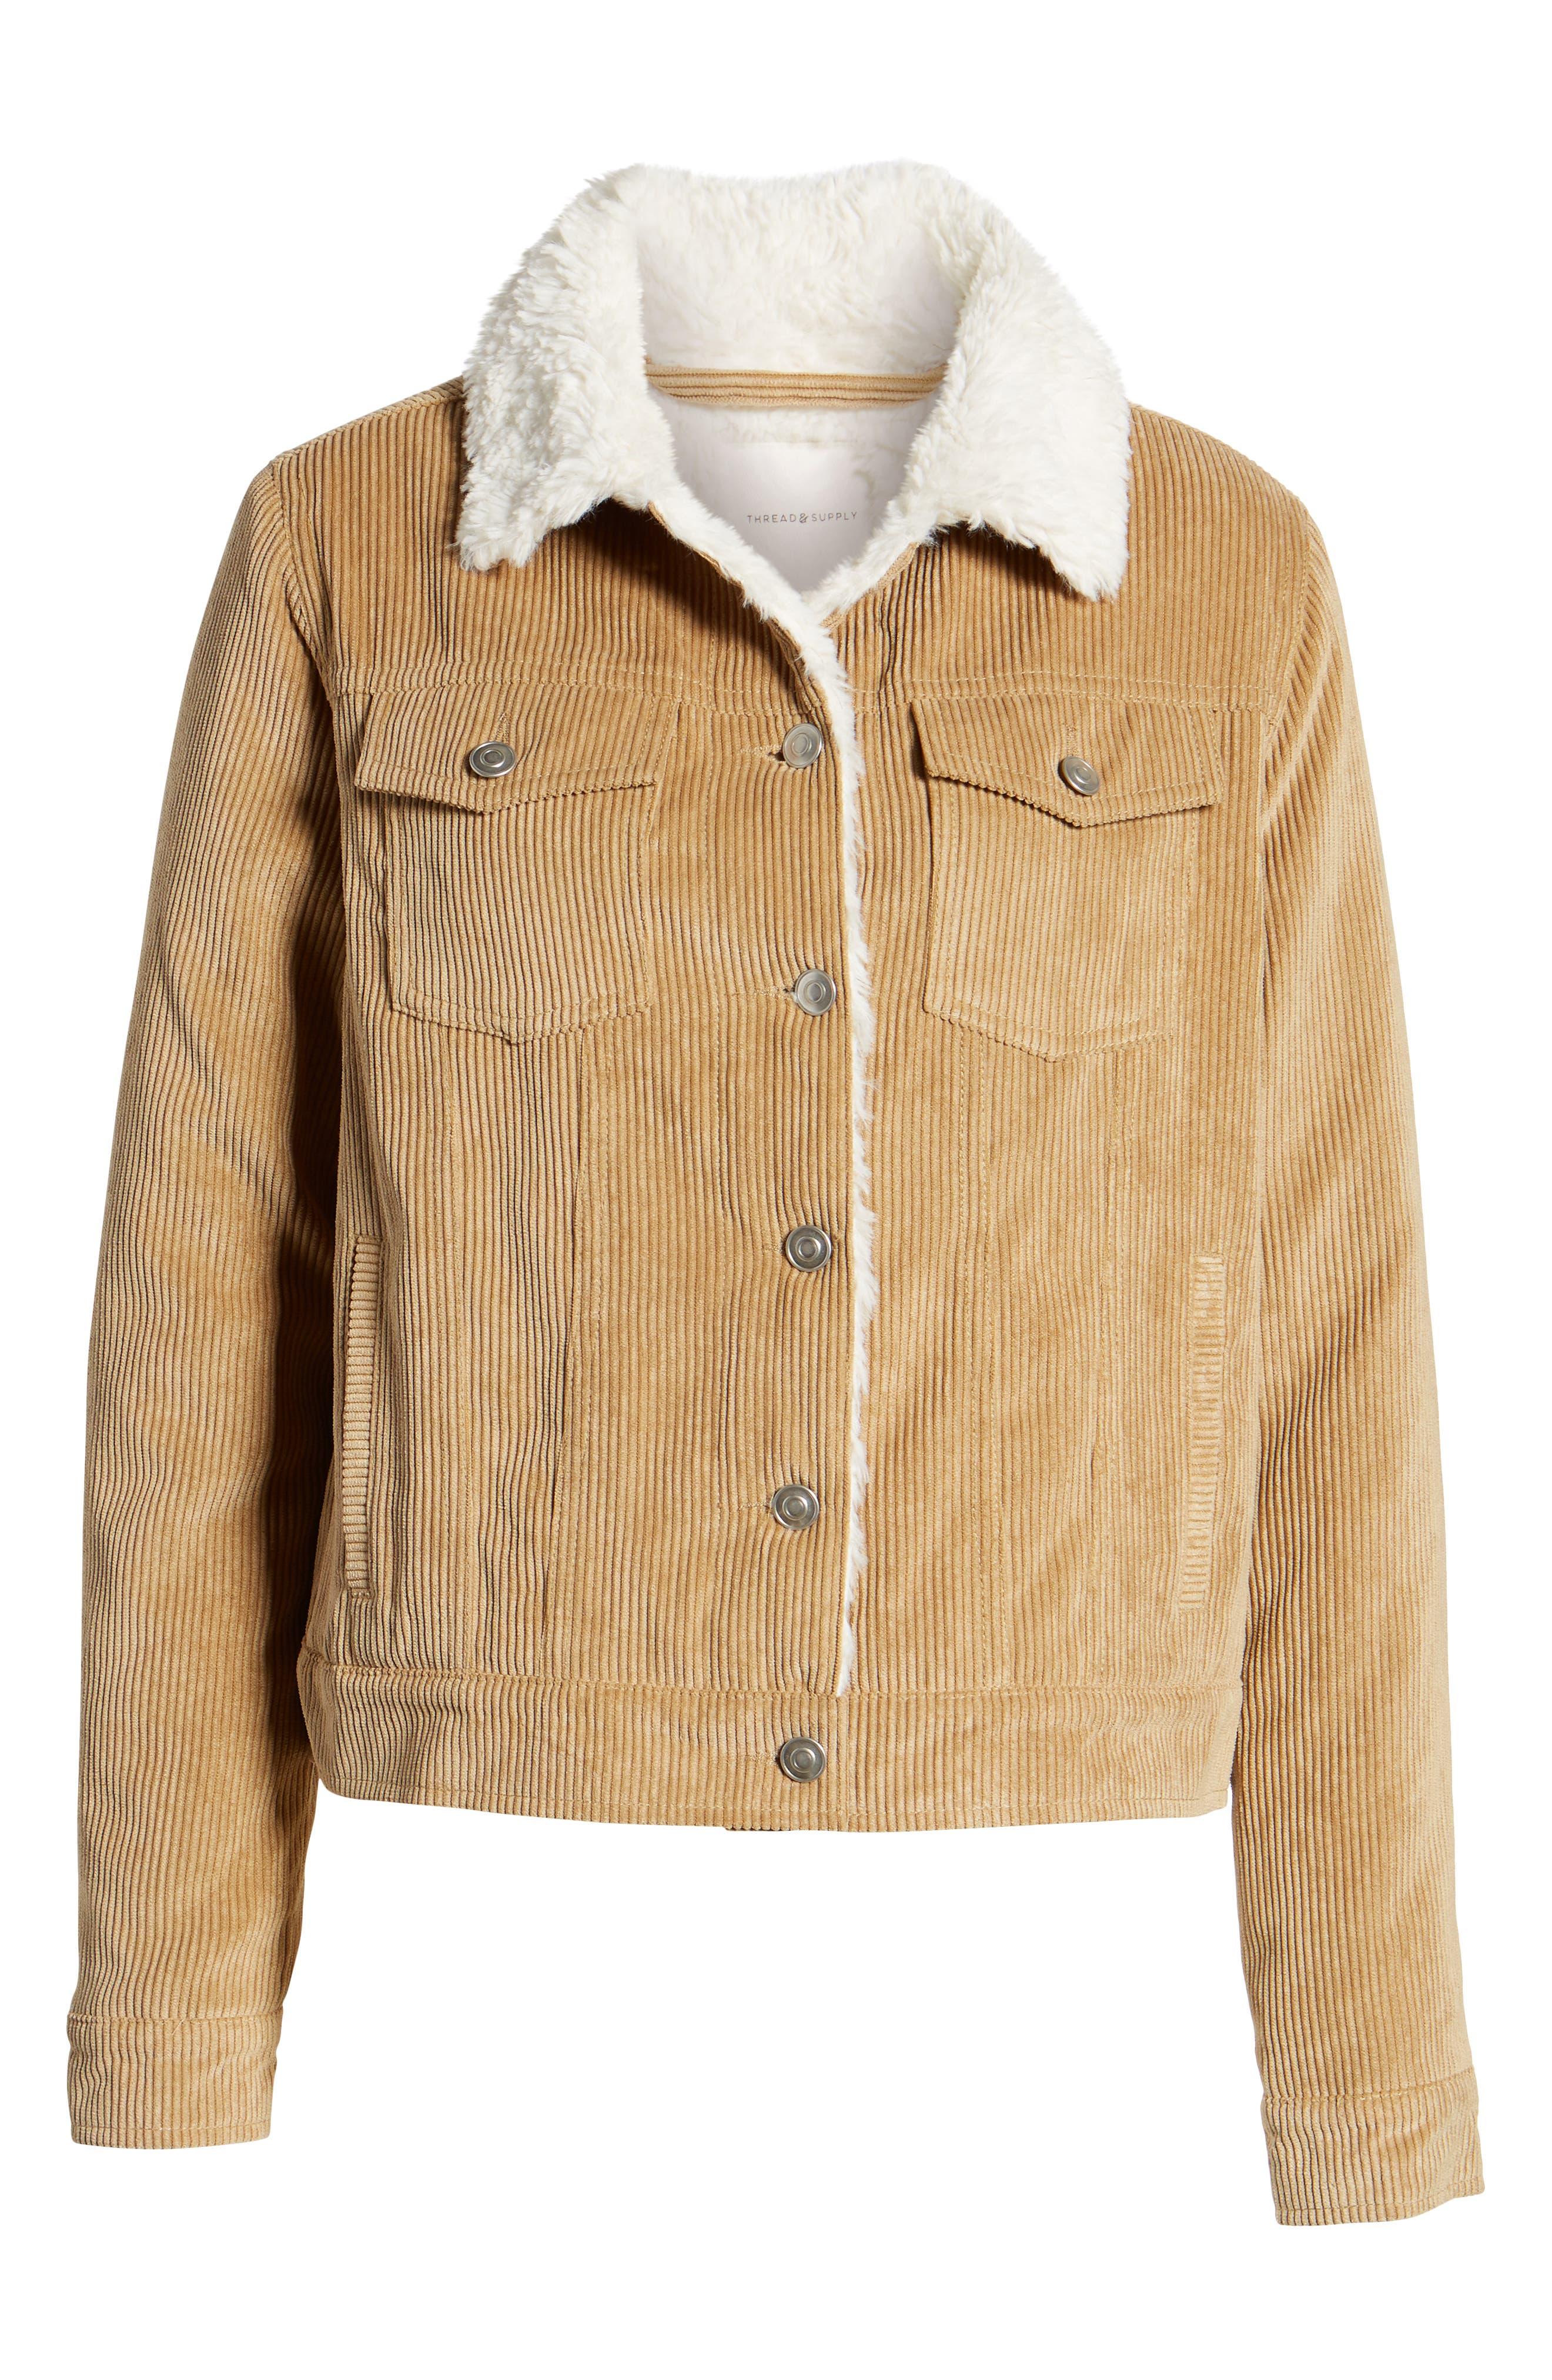 THREAD & SUPPLY, Paddington Fleece Lined Corduroy Jacket, Alternate thumbnail 6, color, KHAKI